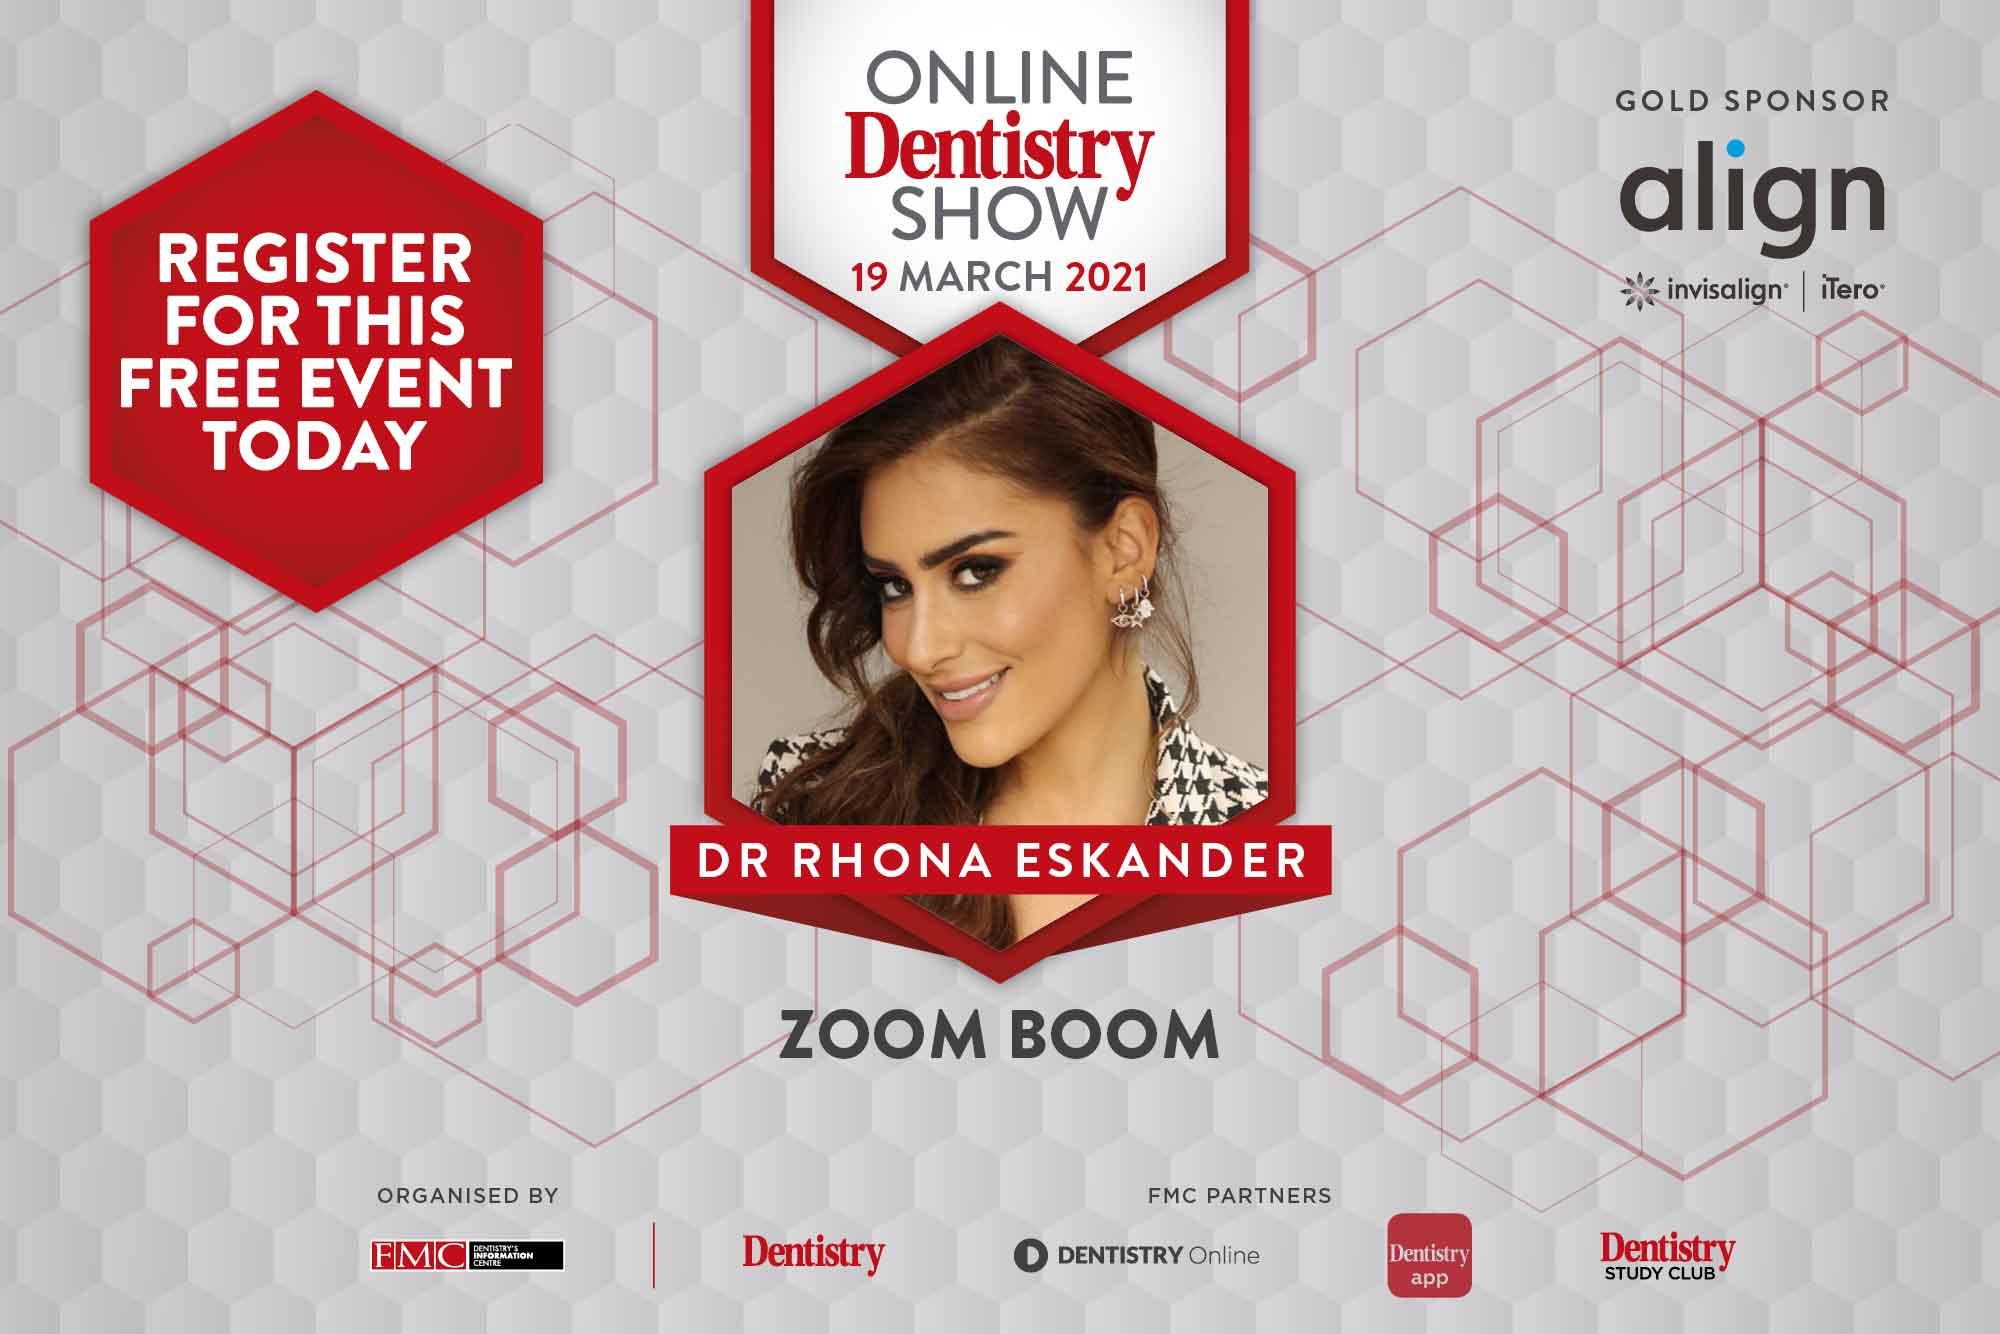 rhona eskander online dentistry show